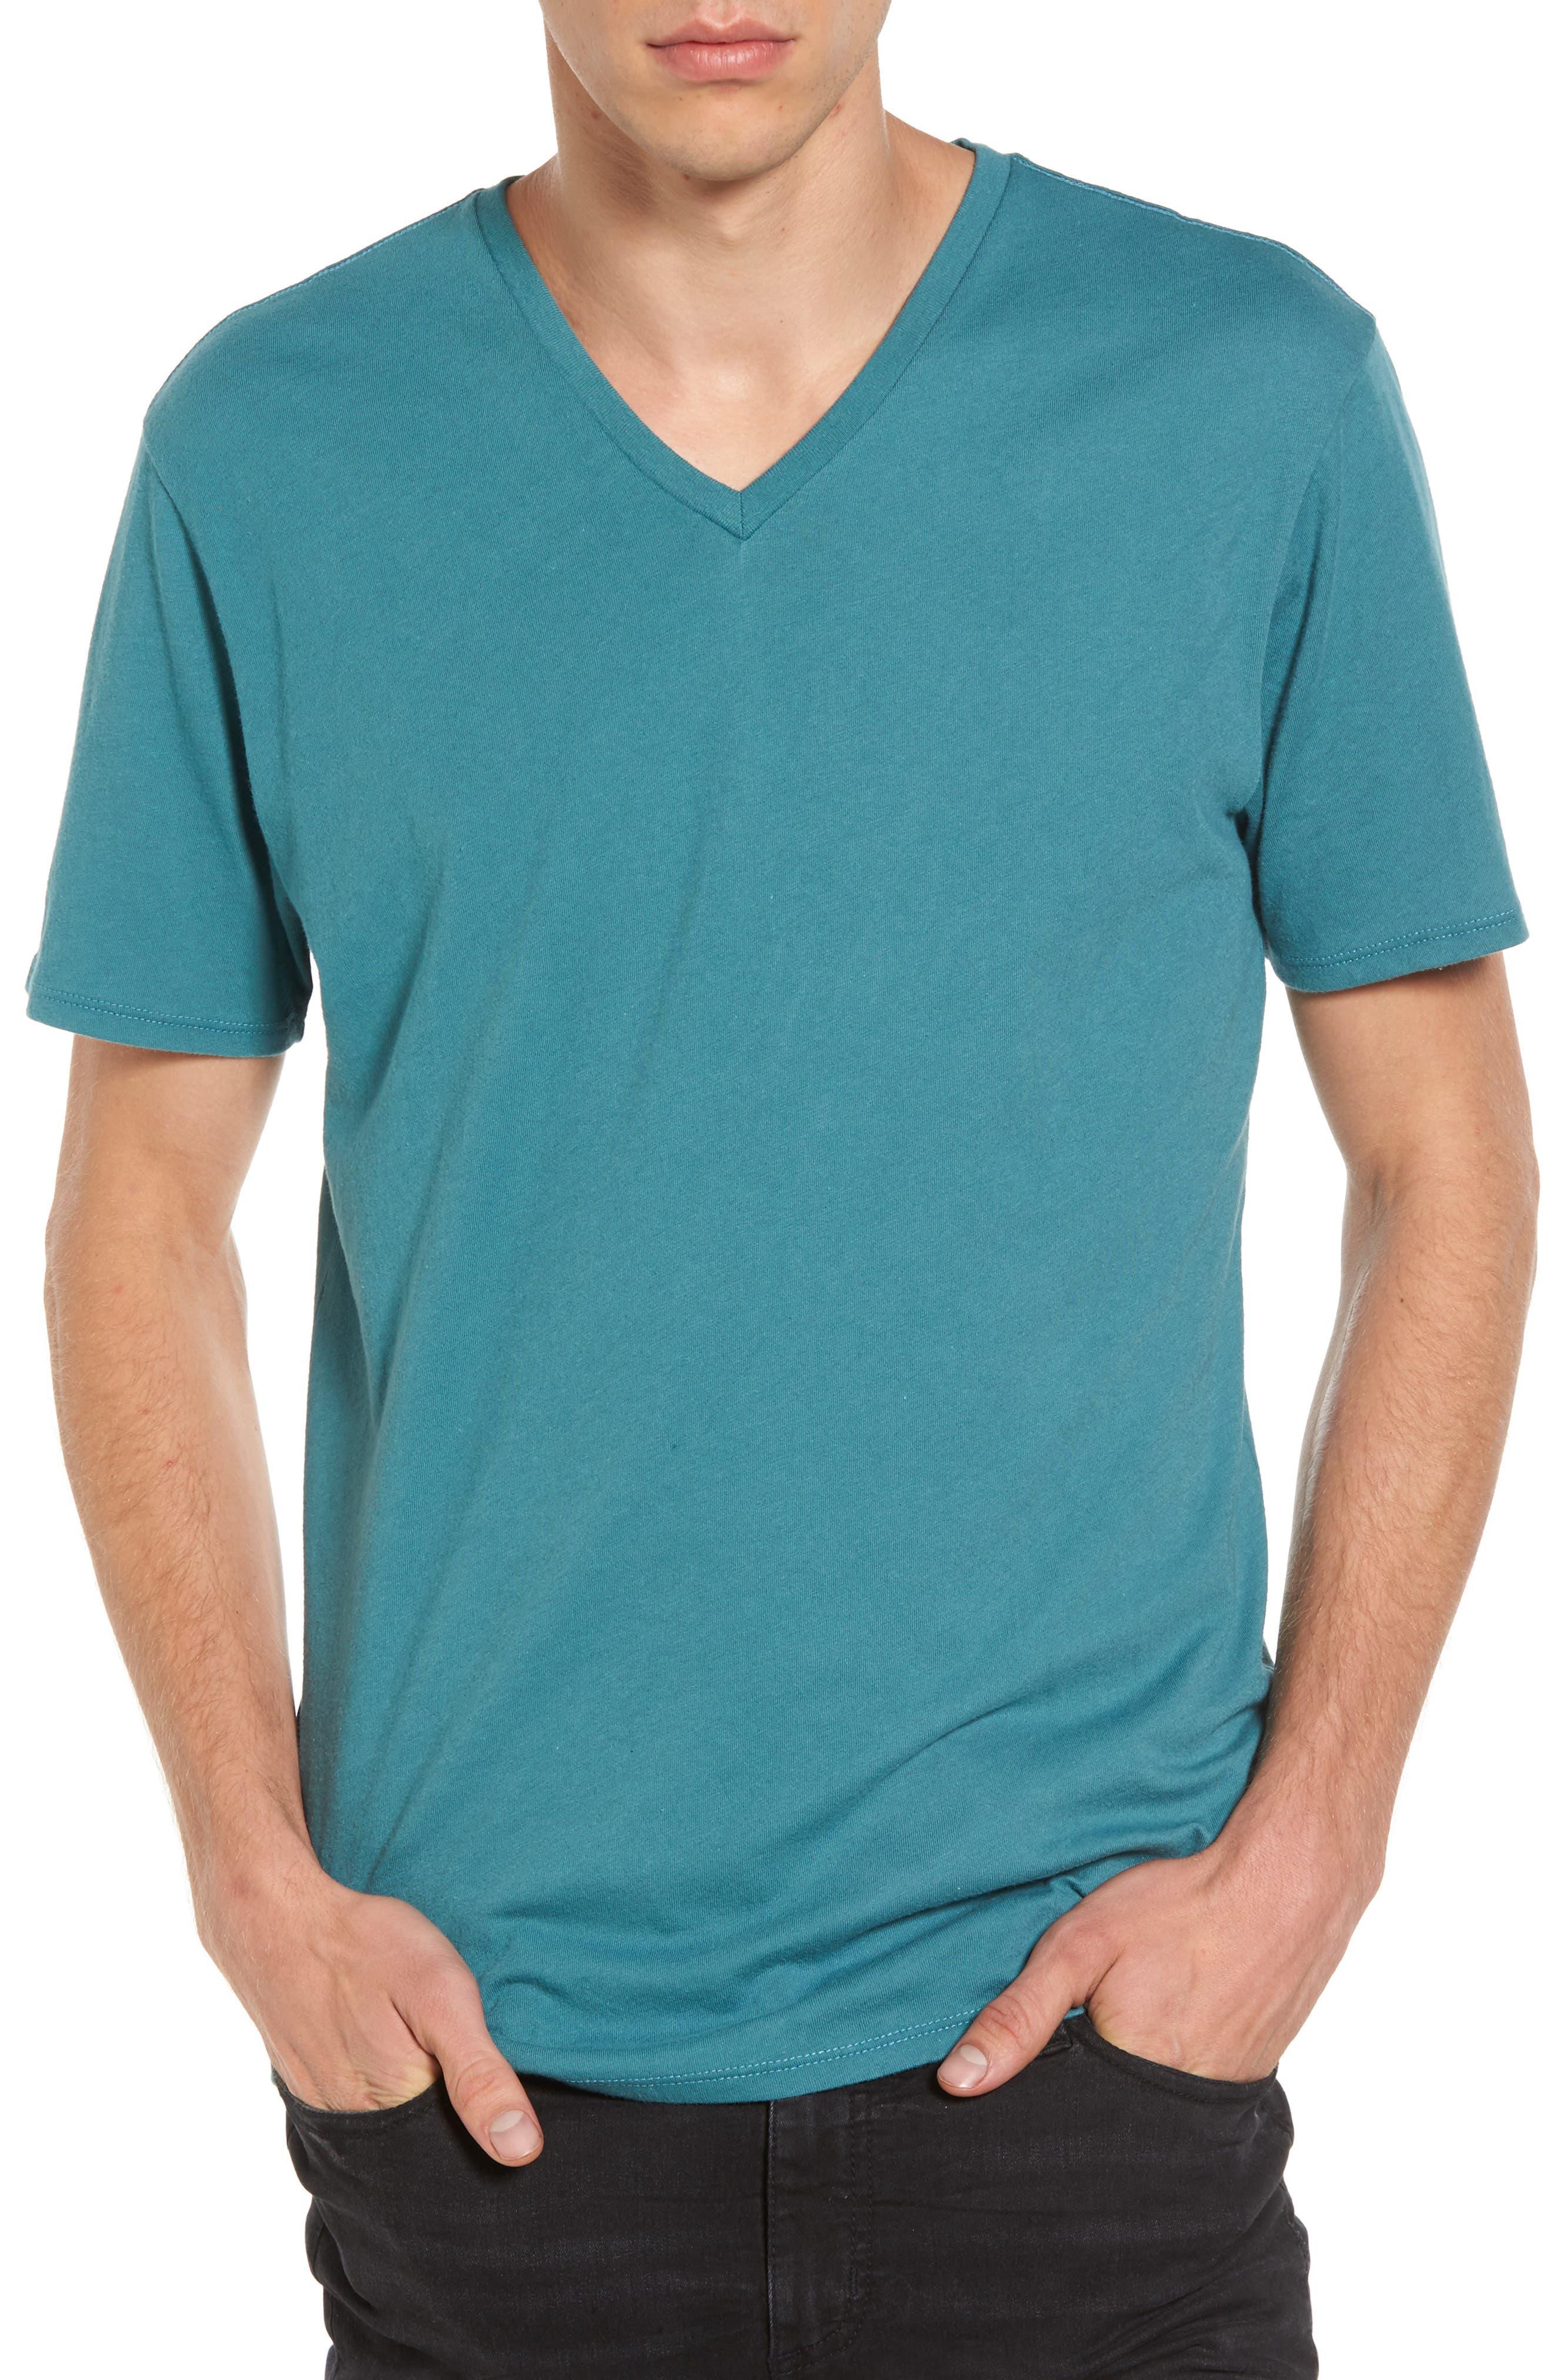 The Rail Slim Fit V-Neck T-Shirt